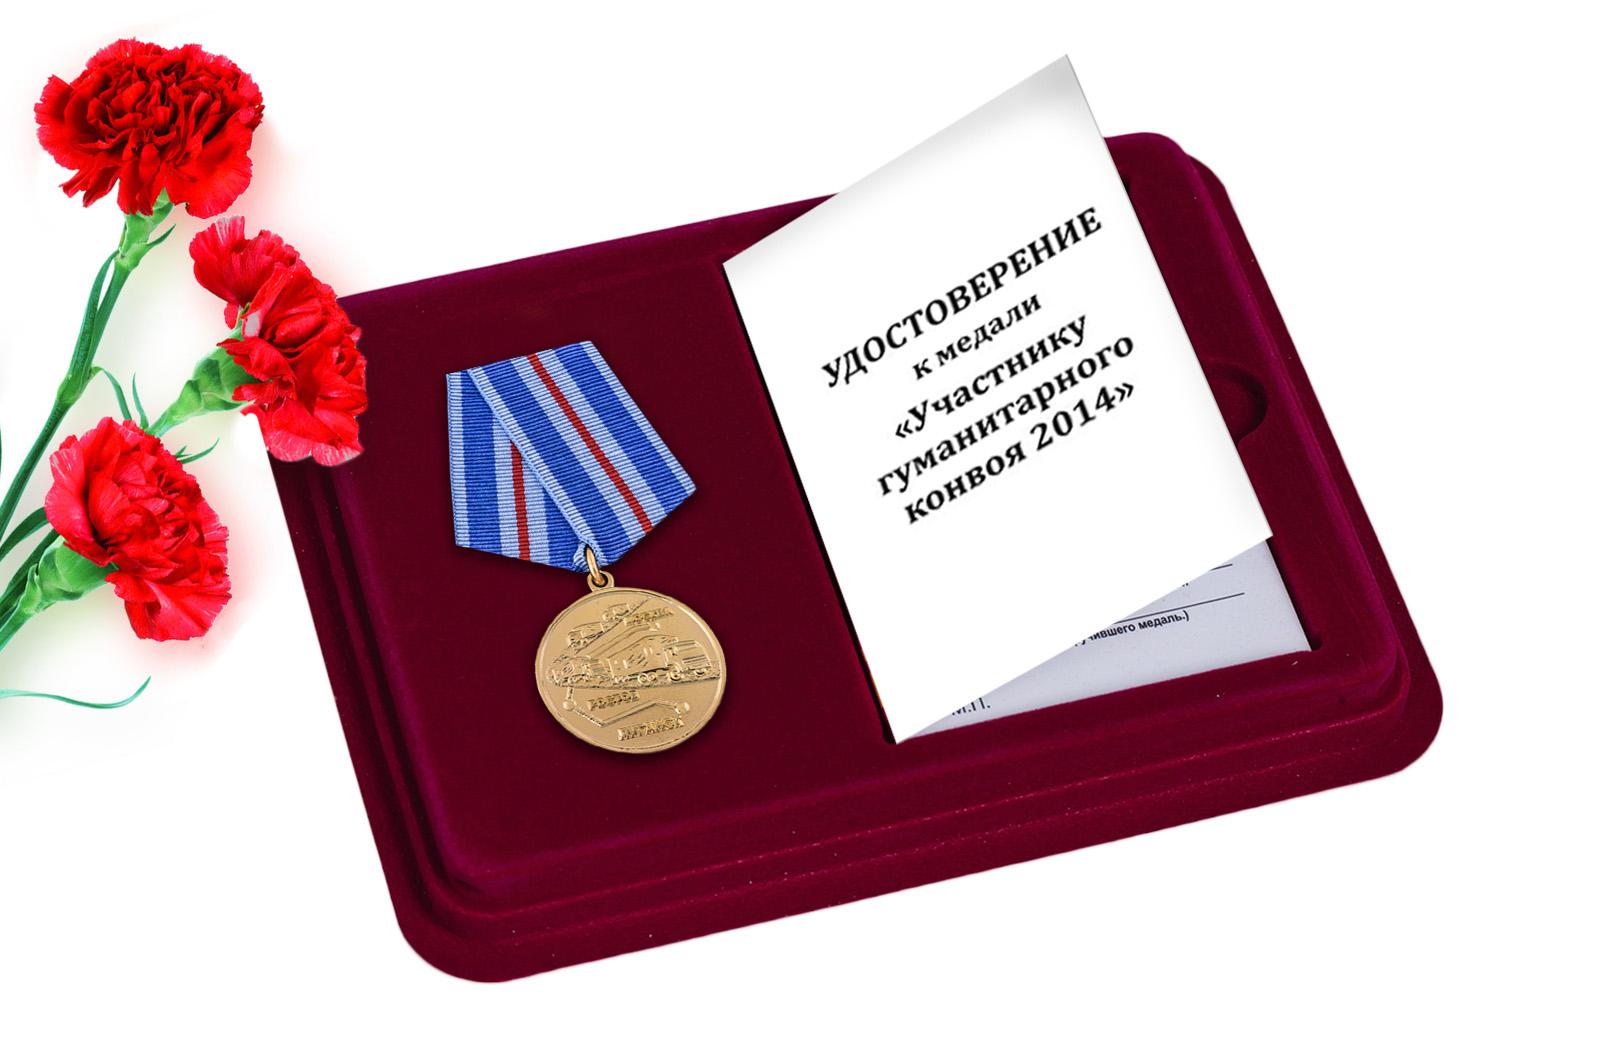 Памятная медаль Участнику гуманитарного конвоя 2014